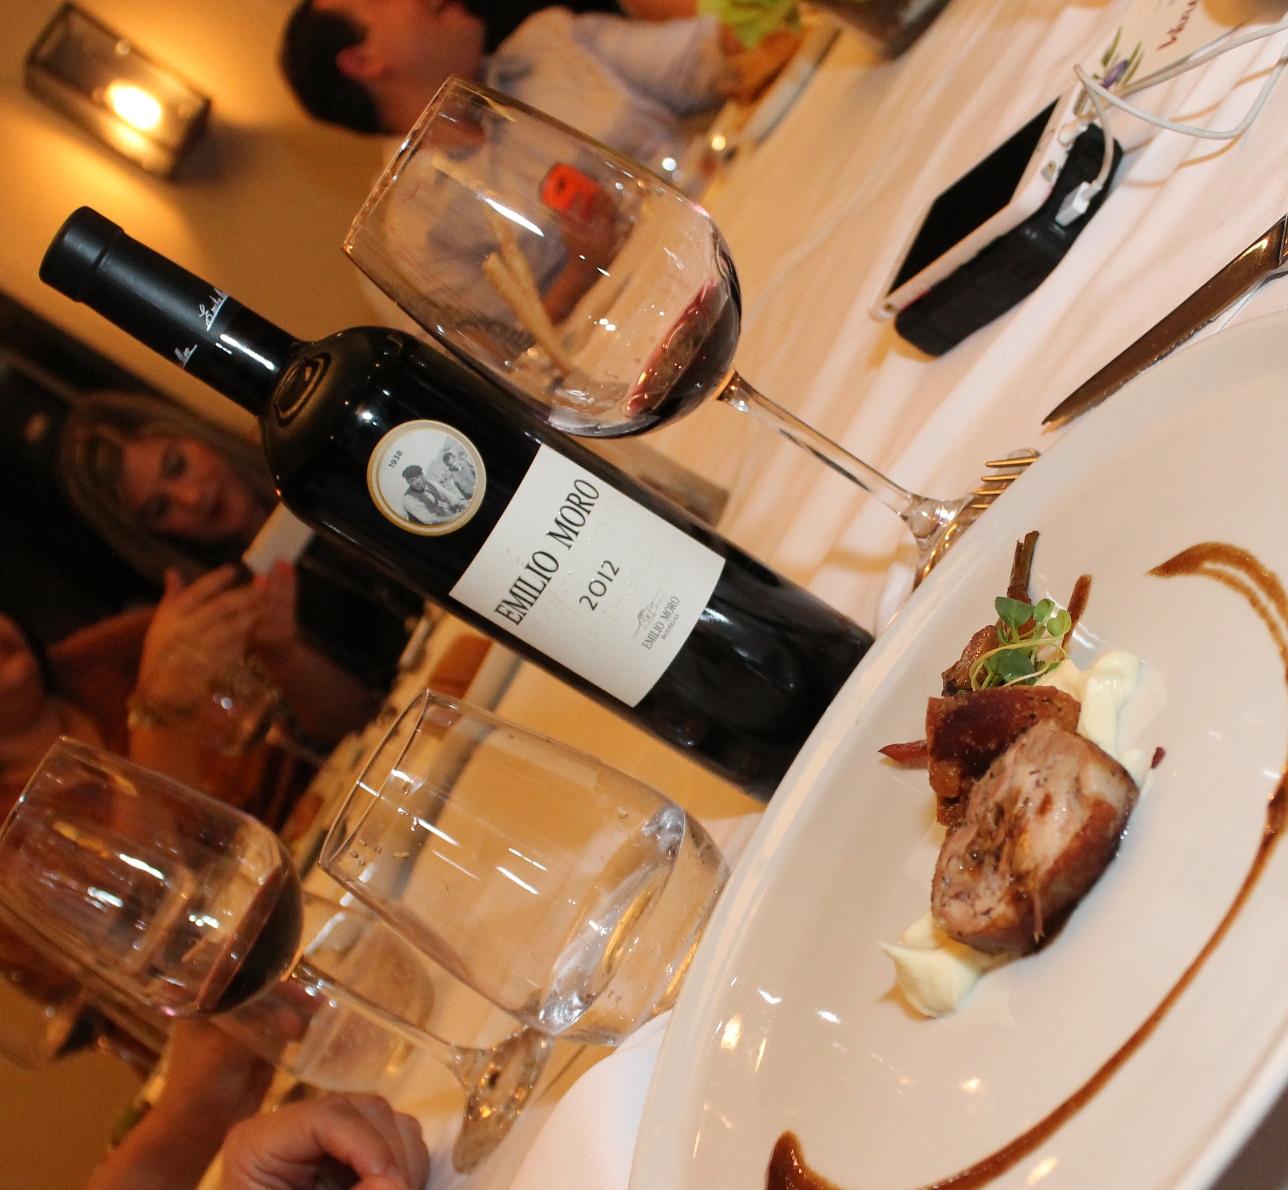 La Enoteca Food & Wine Tour con Emilio Moro